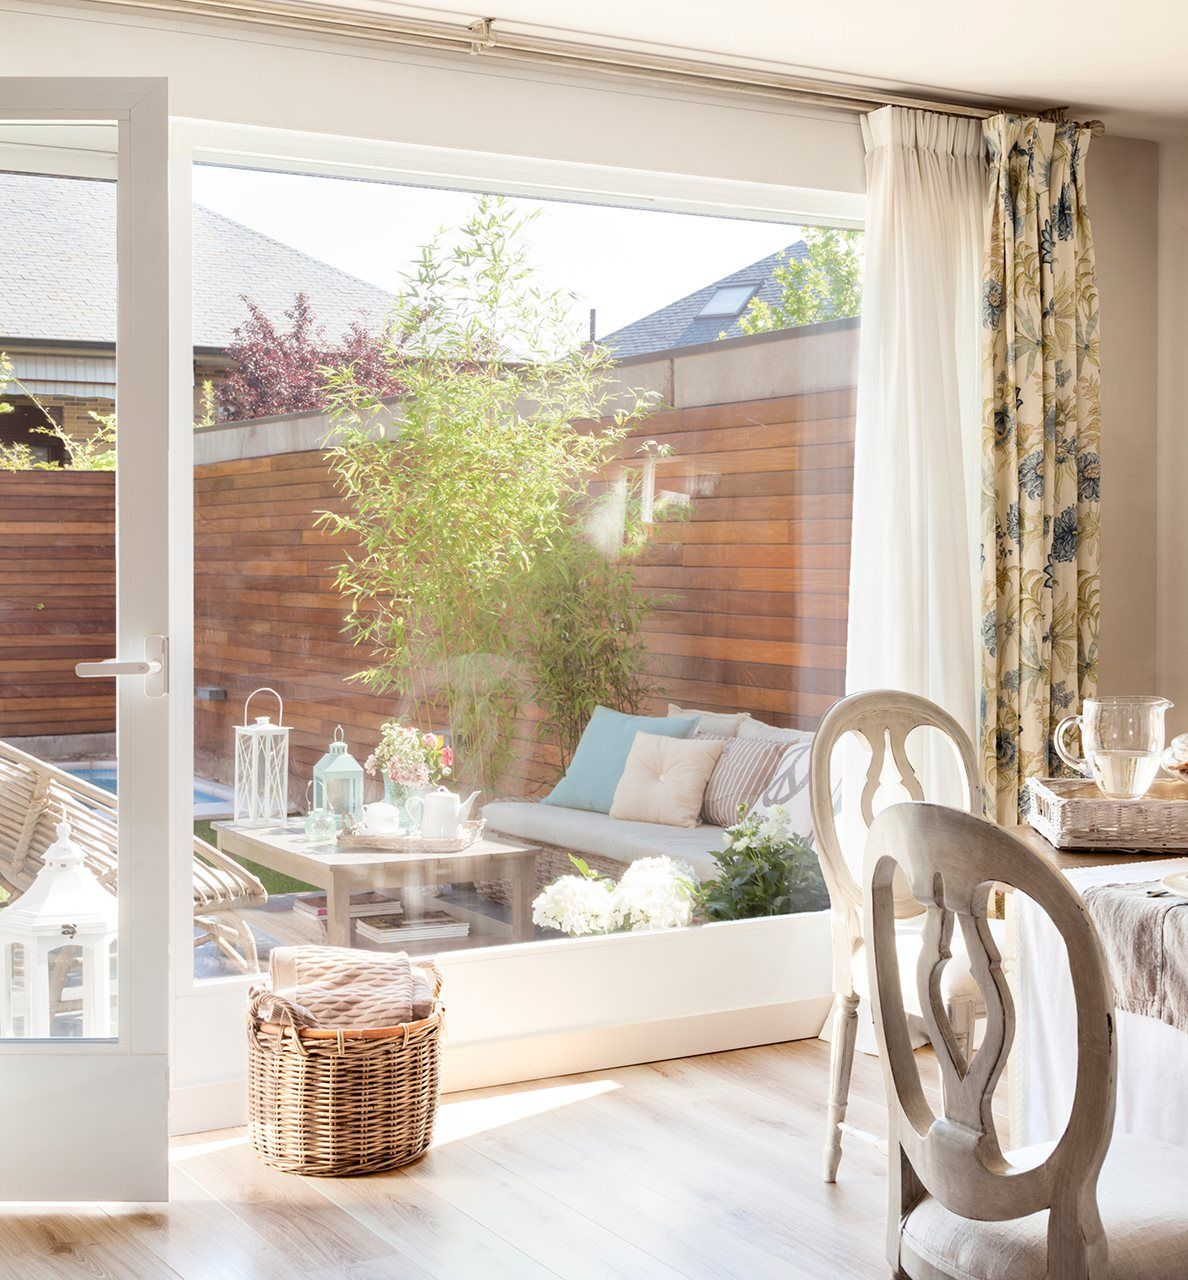 Bay window design exterior  estar exterior  galeria  pinterest  patios porch and verandas